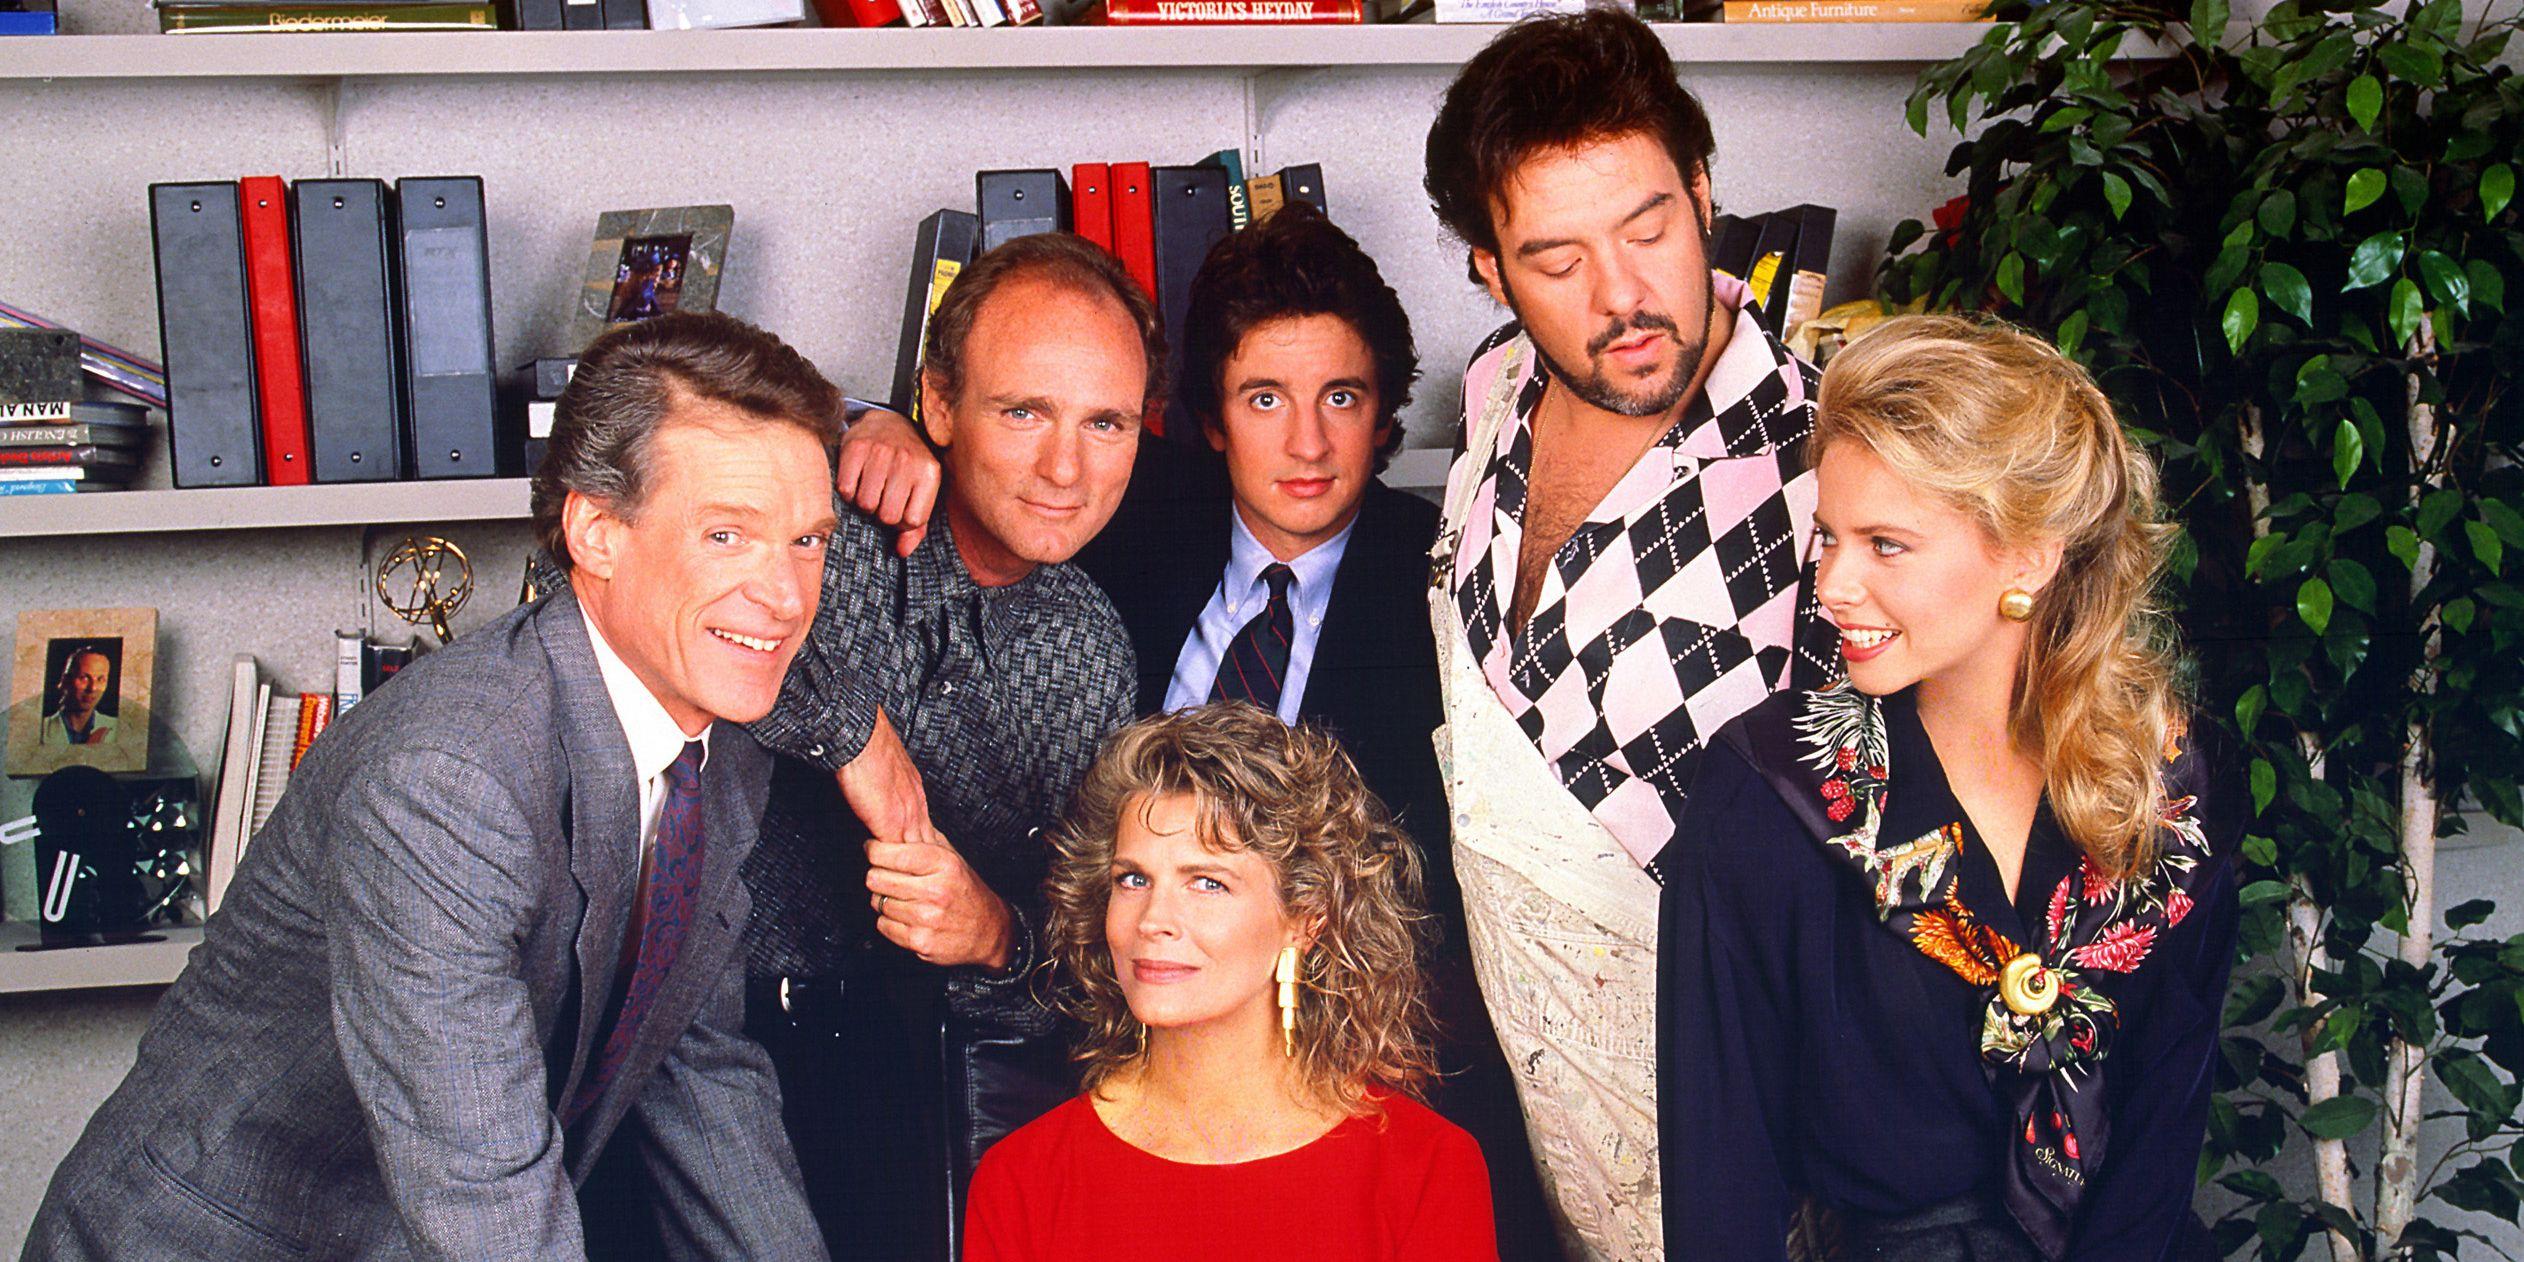 Murphy Brown 2018 Reboot Cast News Air Date Spoilers